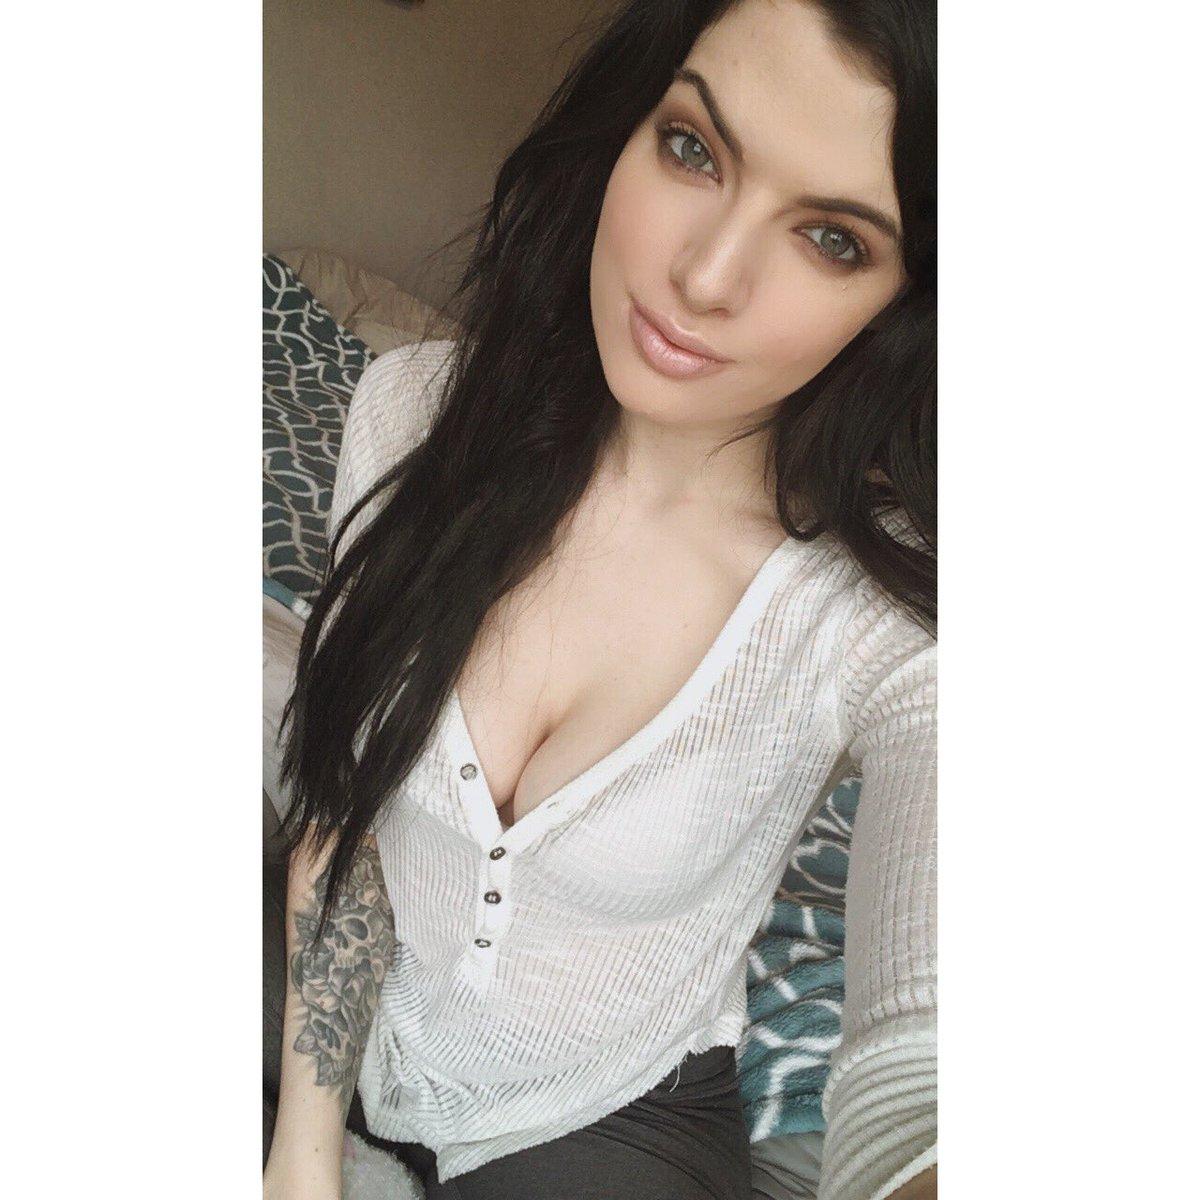 RT if you love brunettes 😍😍😍 9xeVZ8TNfZ